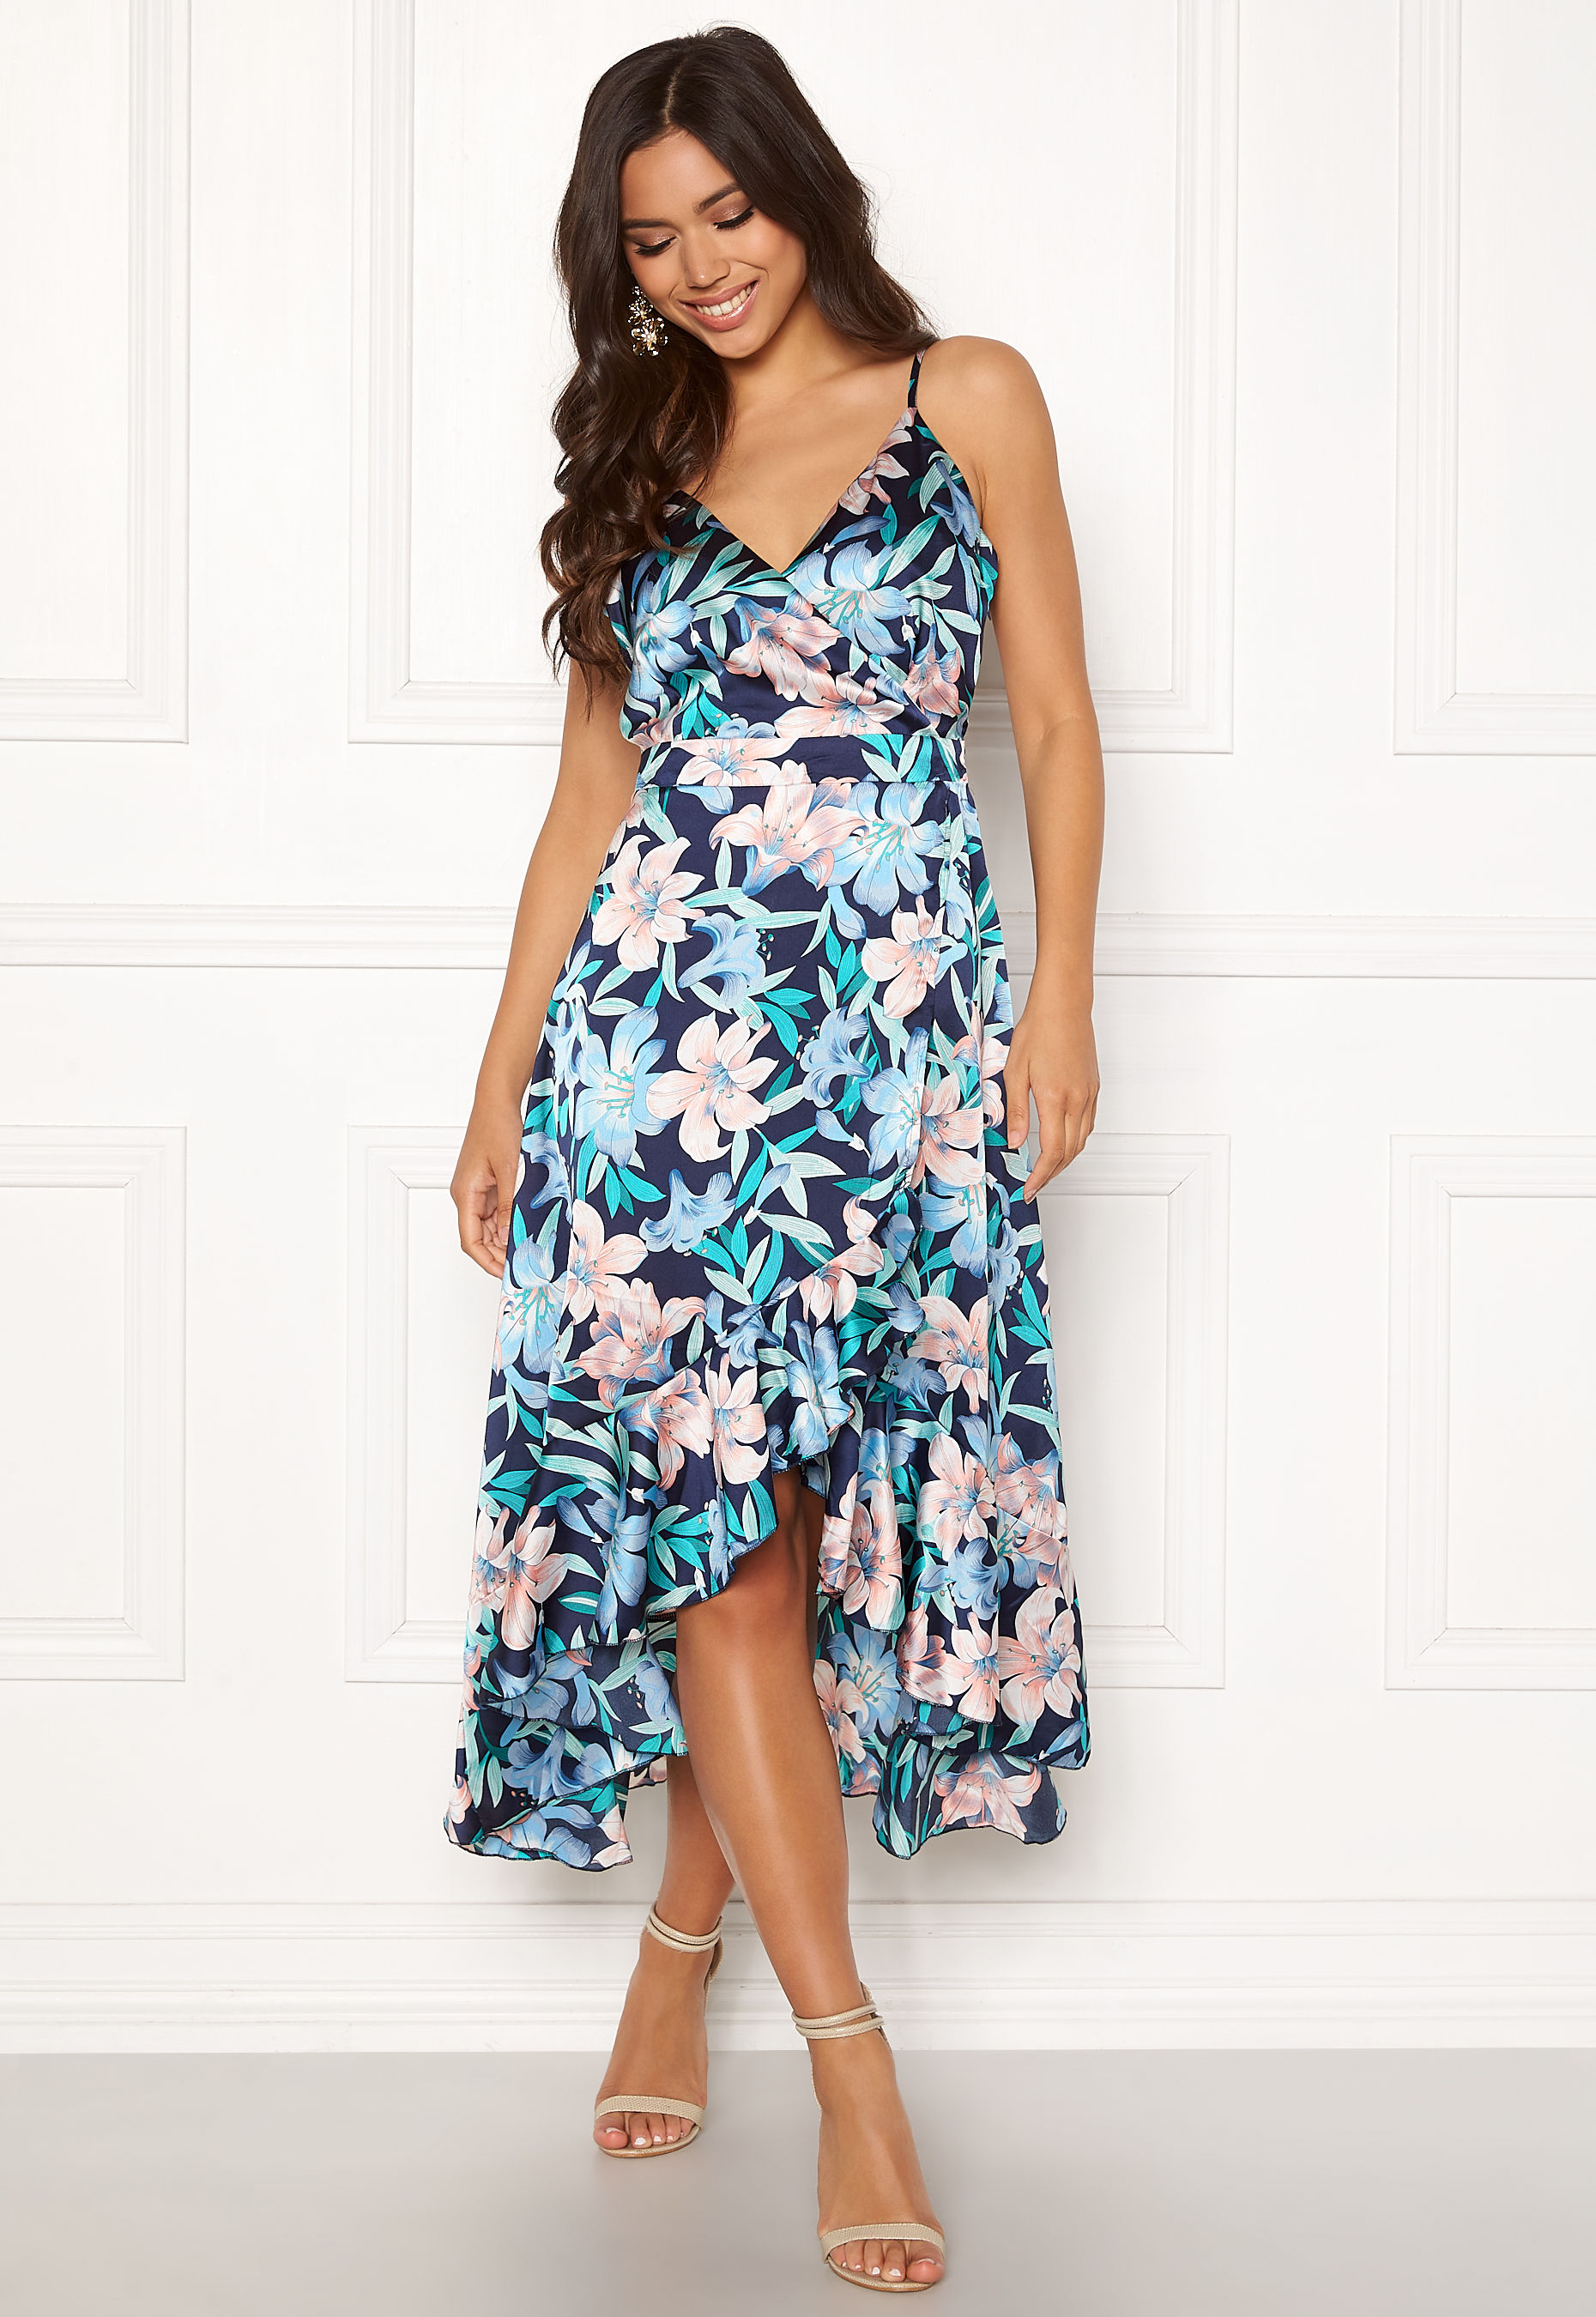 6171547c23 Blue Vanilla Floral Frilly Dress Blue - Bubbleroom